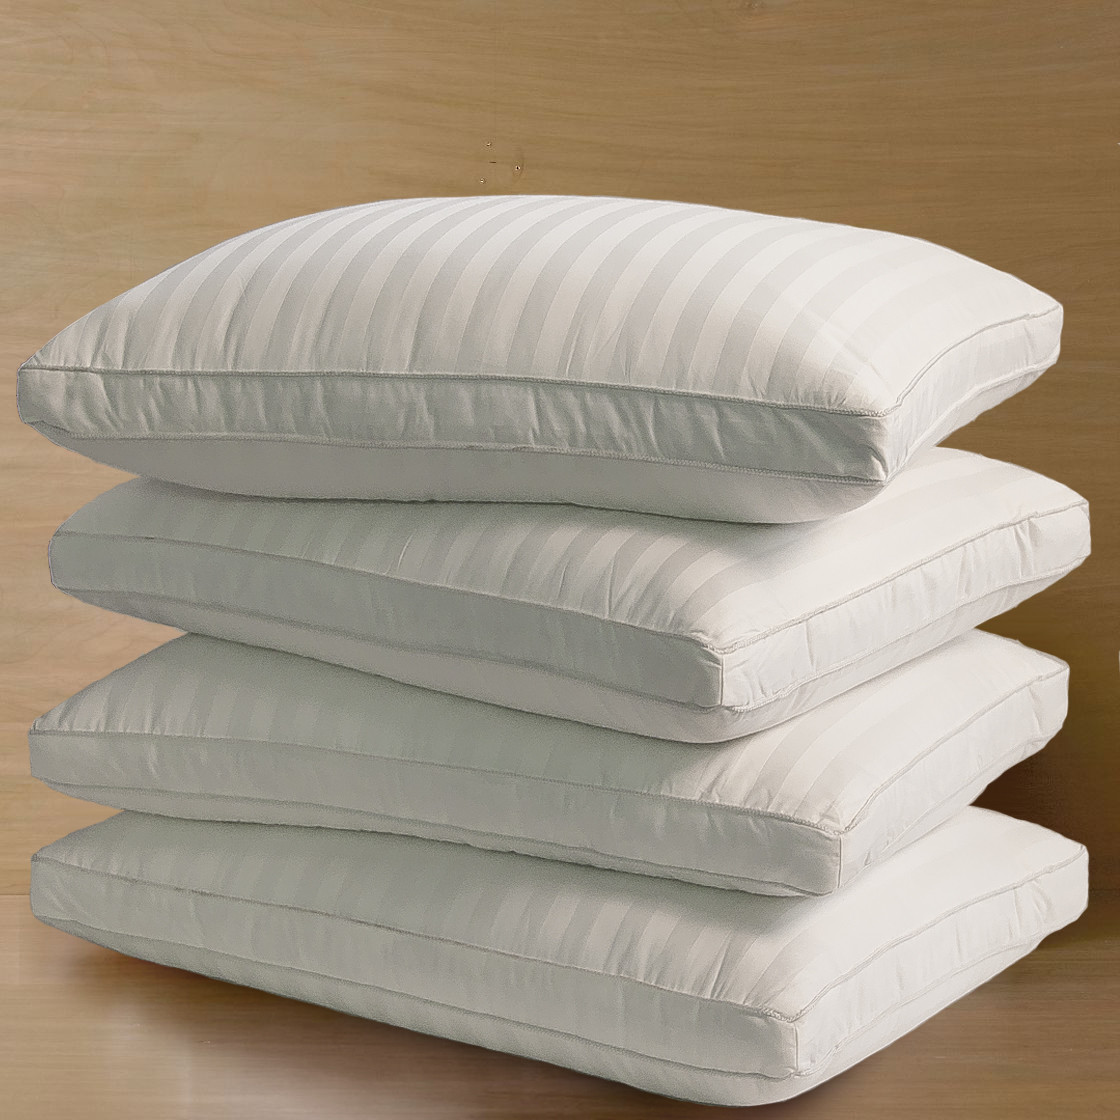 350T Damask Stripe Cotton Cover Optima-Loft Down Alt Jumbo Pillow 4-Pack